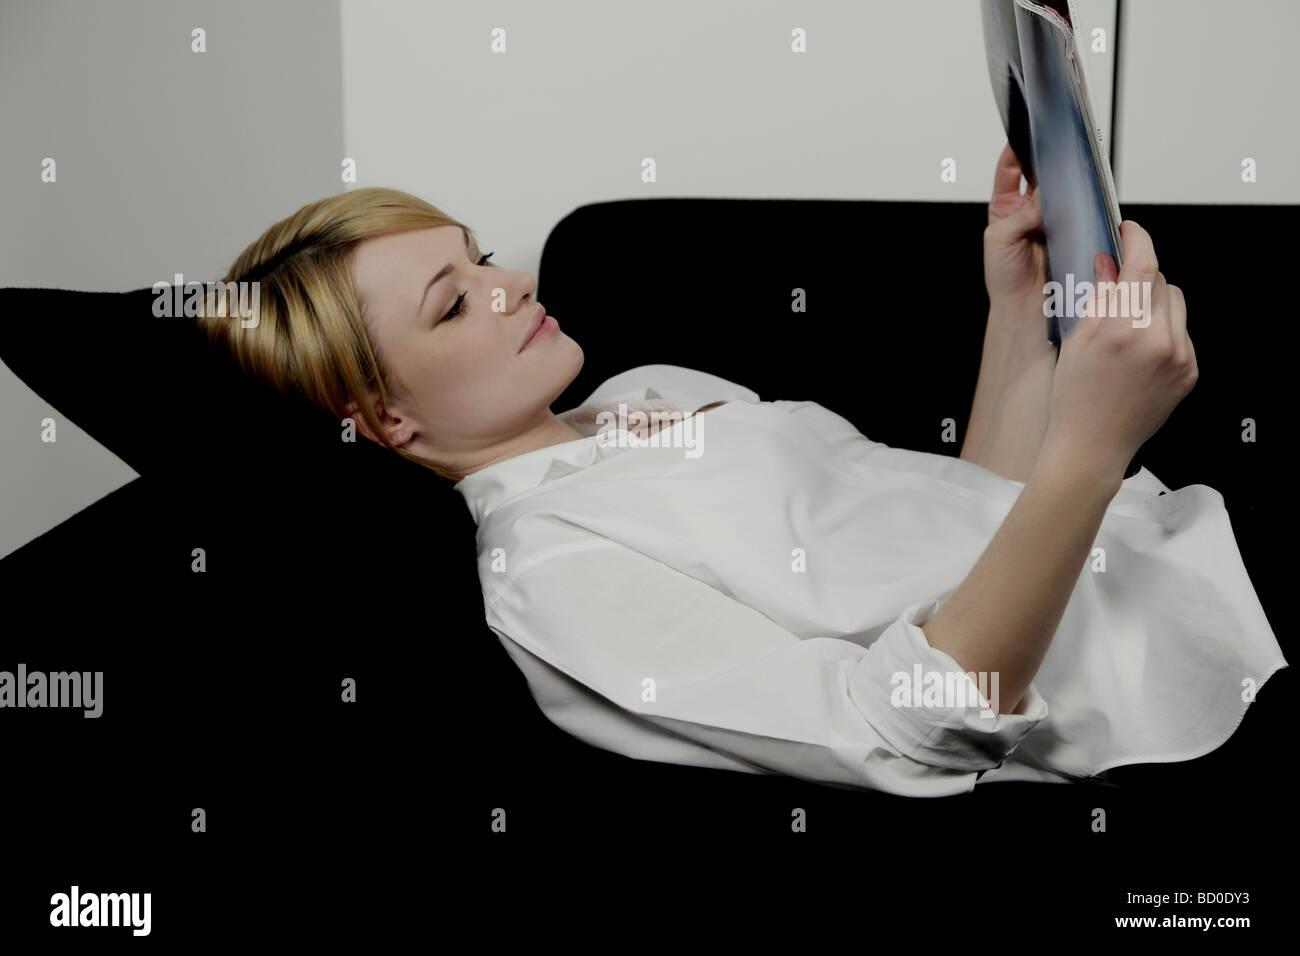 Verlegung auf Sofa lesen Magazin Frau. Stockfoto